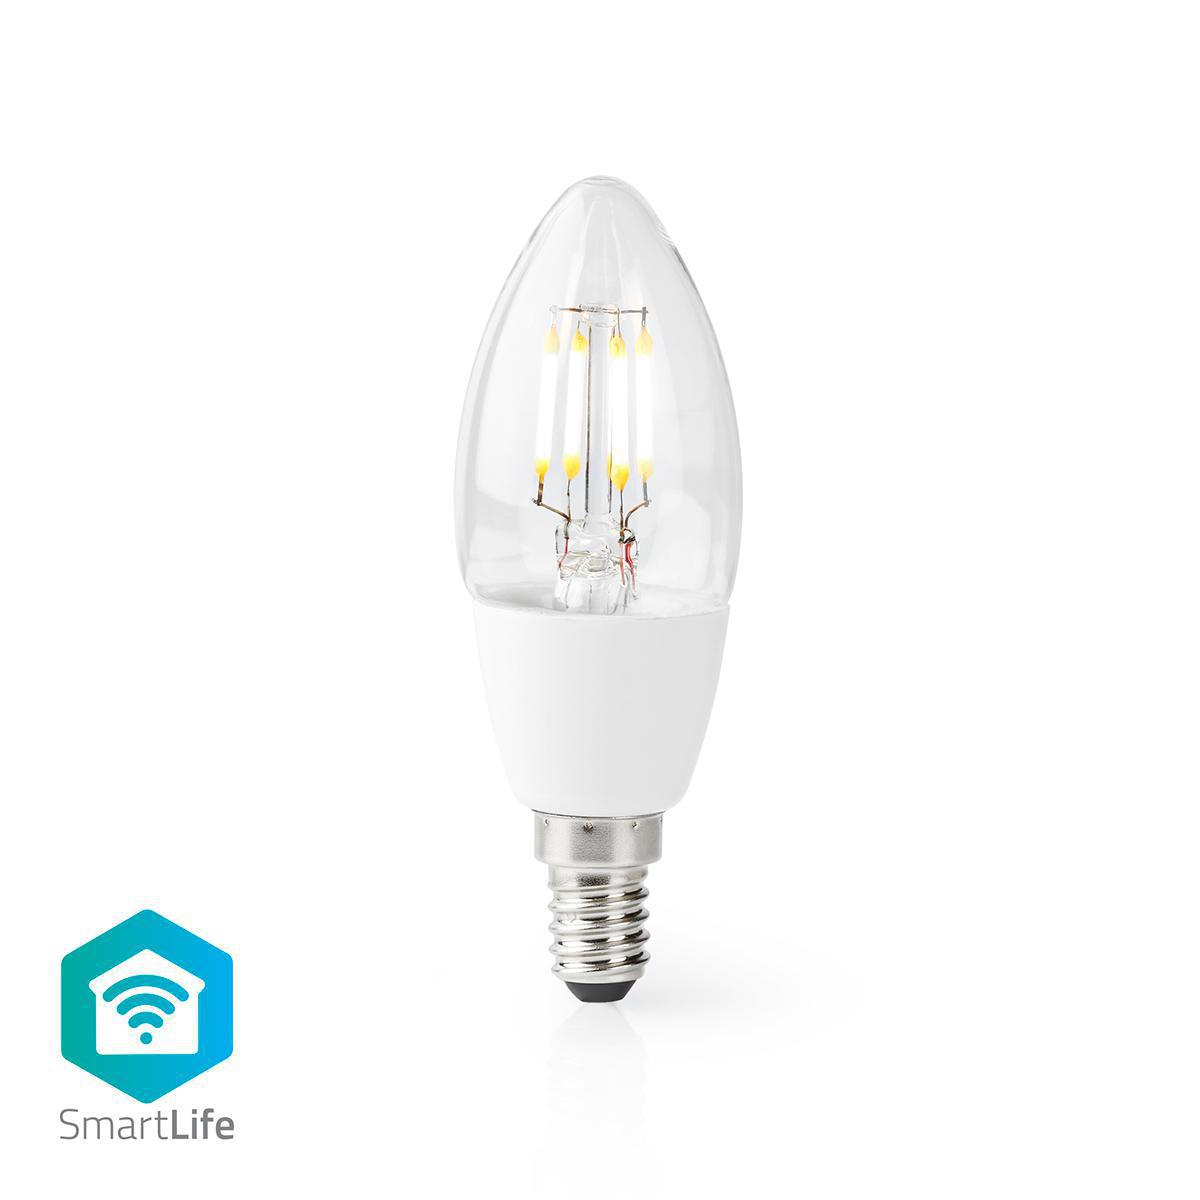 Slimme Led Lamp E14 fitting 2700K - Warm wit - vooraanzicht lamp